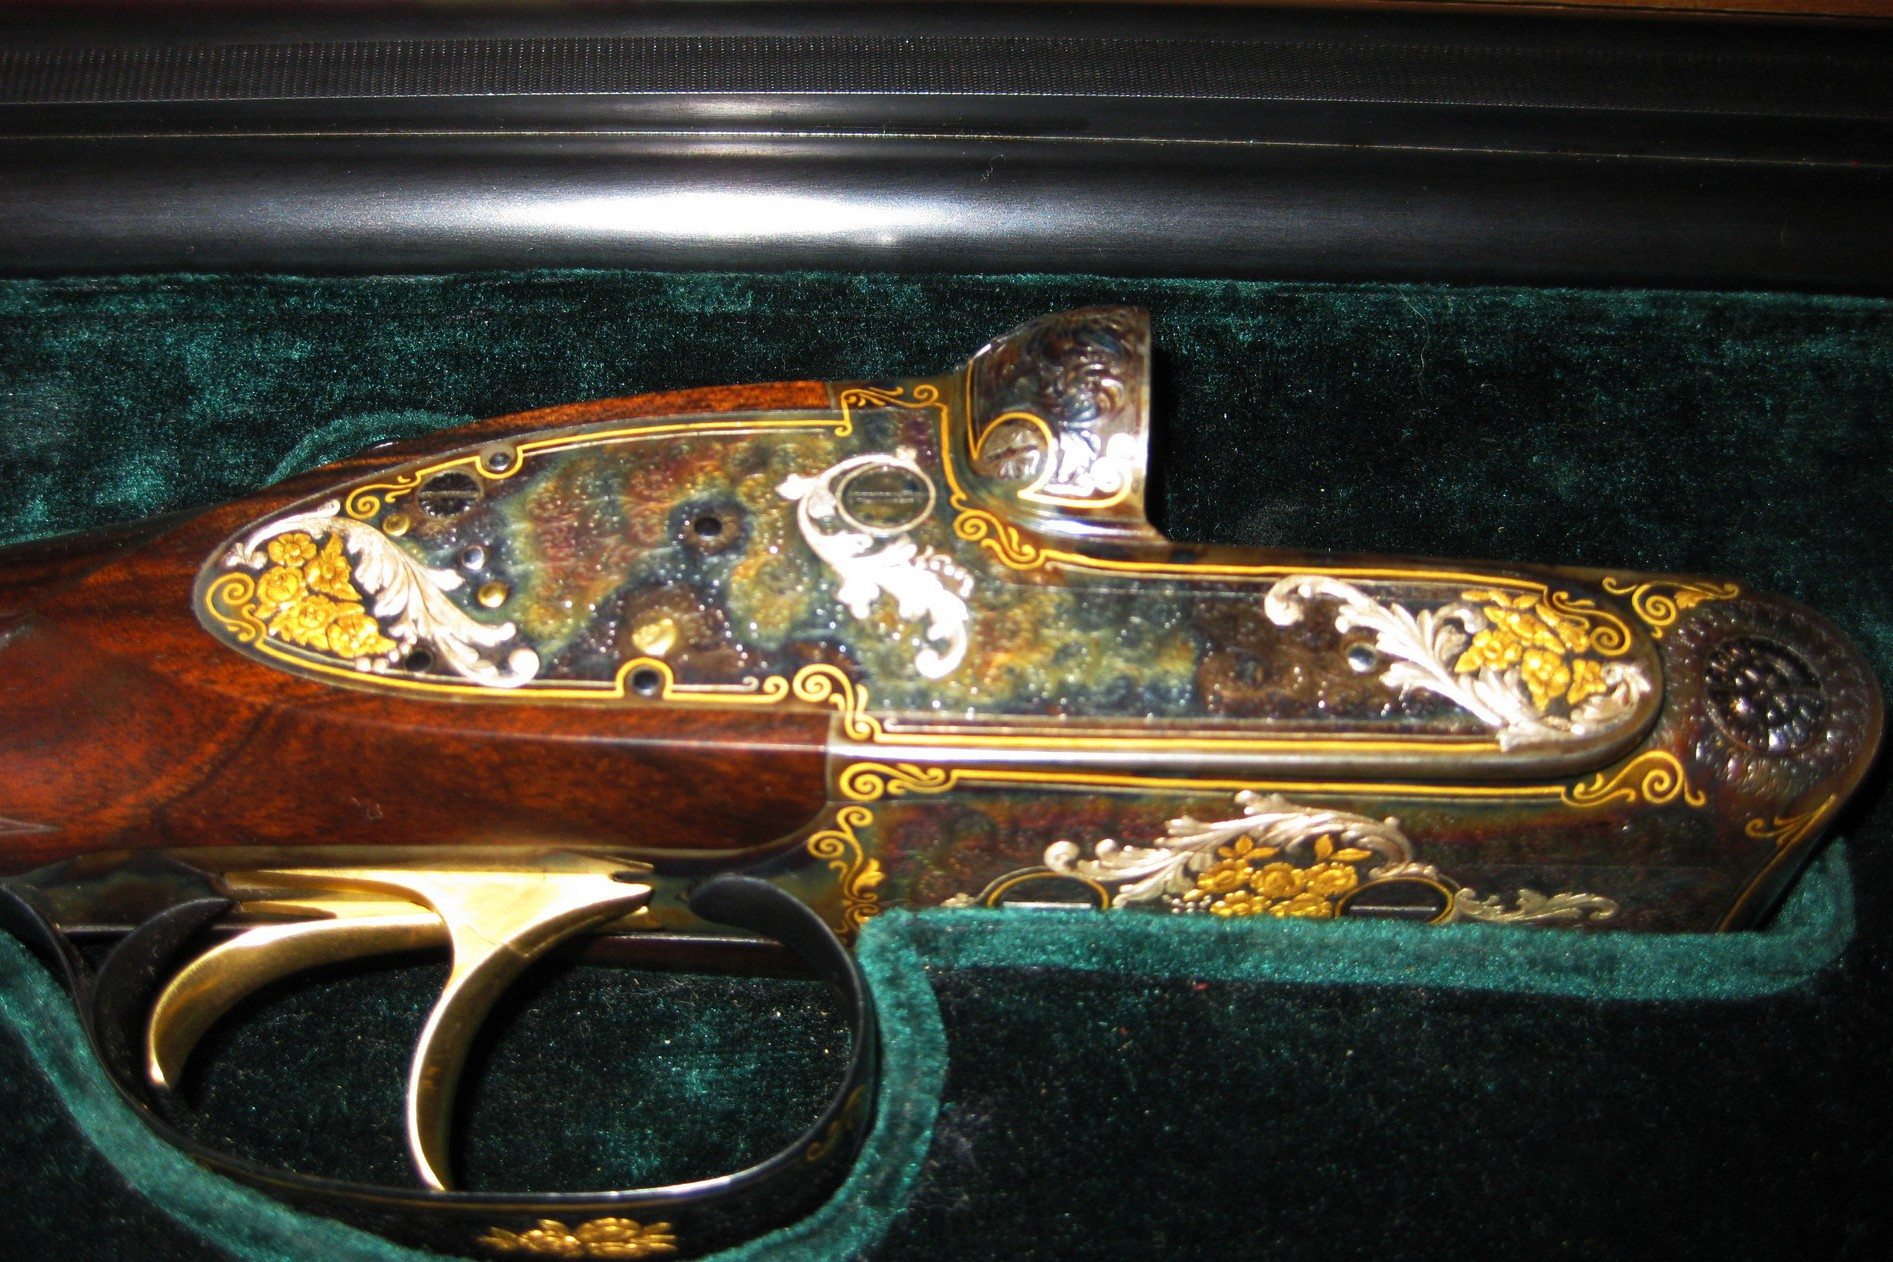 [Linked Image from shotguncollector.files.wordpress.com]